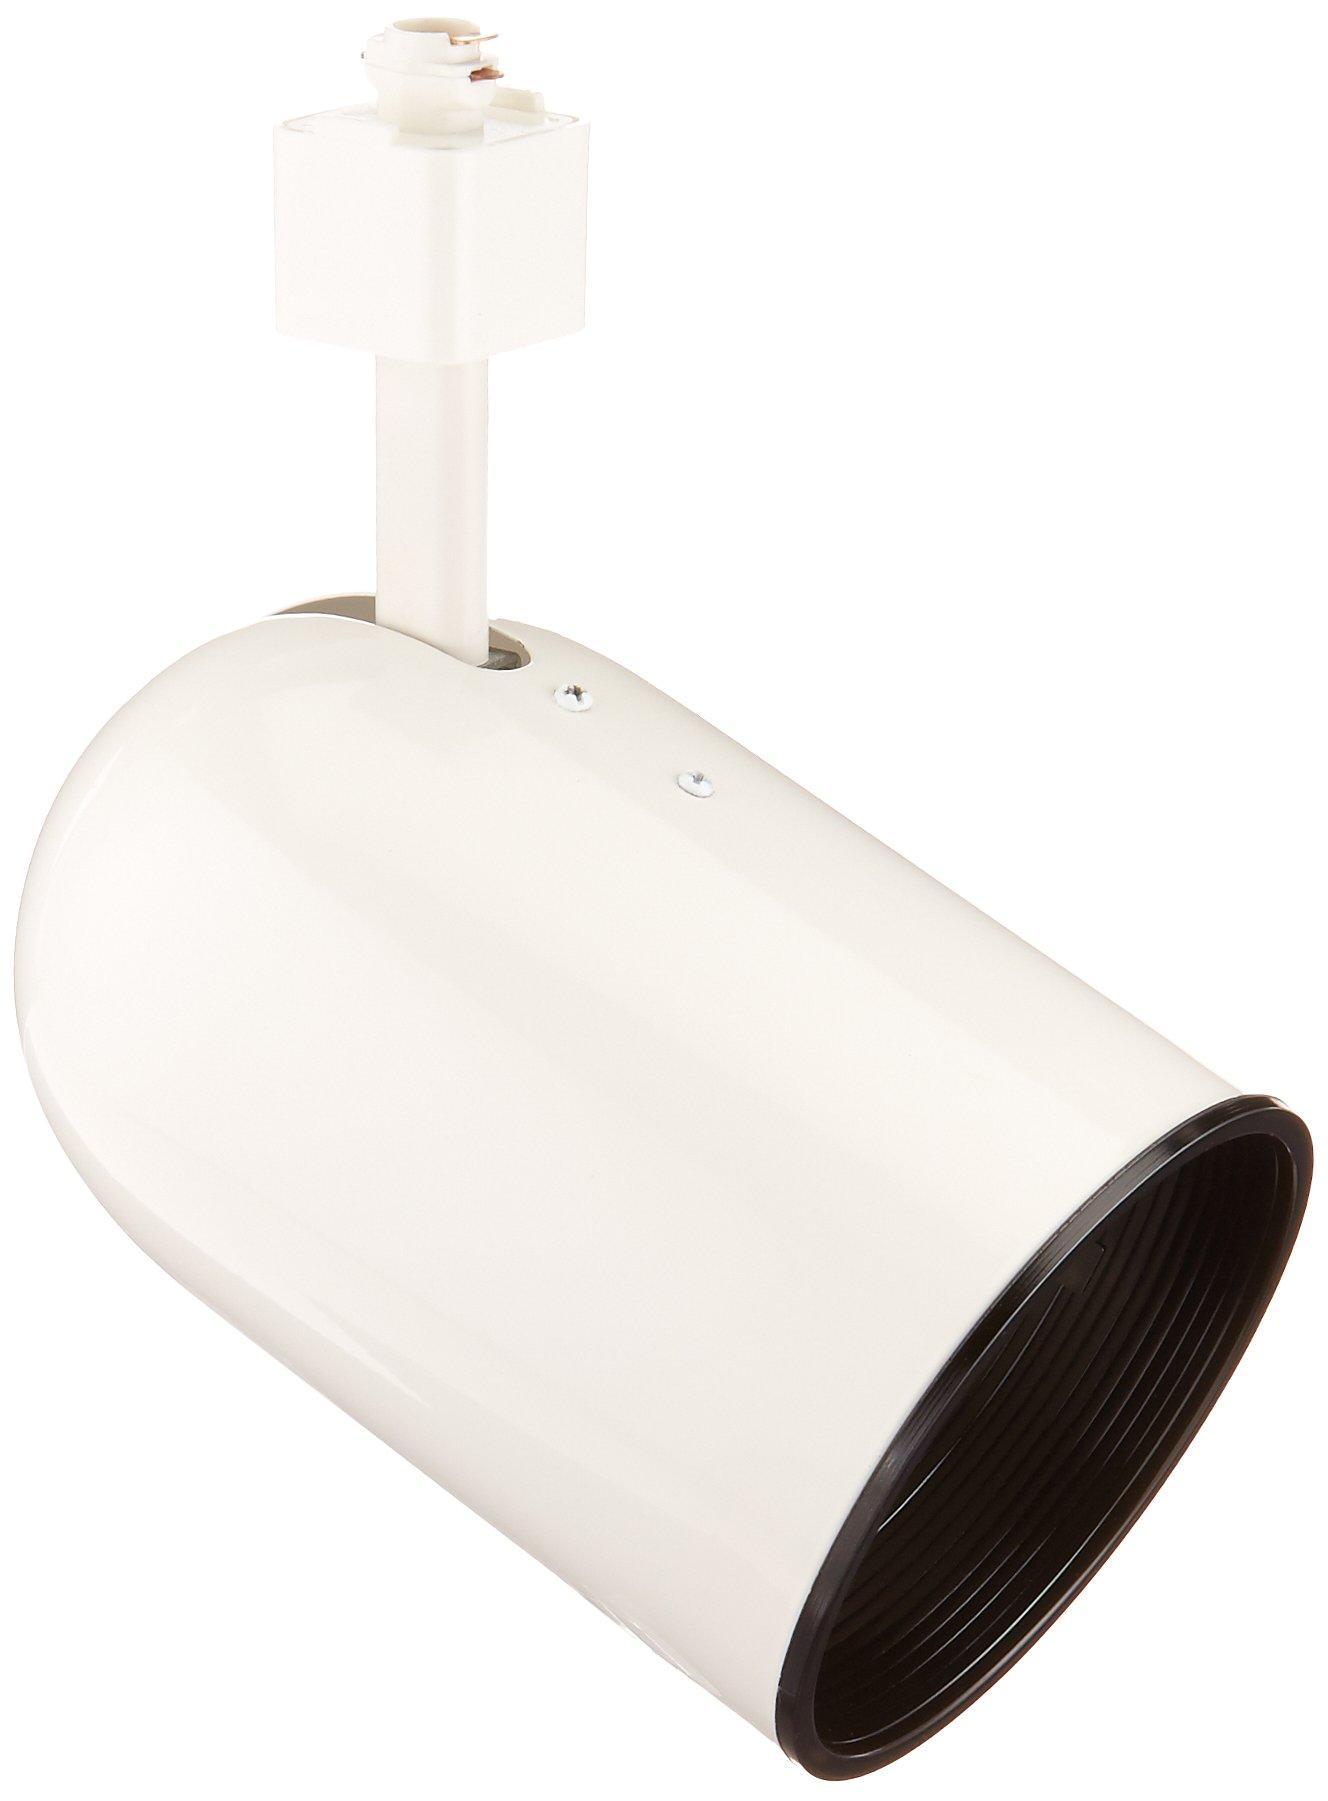 Nuvo Lighting TH210 R30 Bullet Cyl